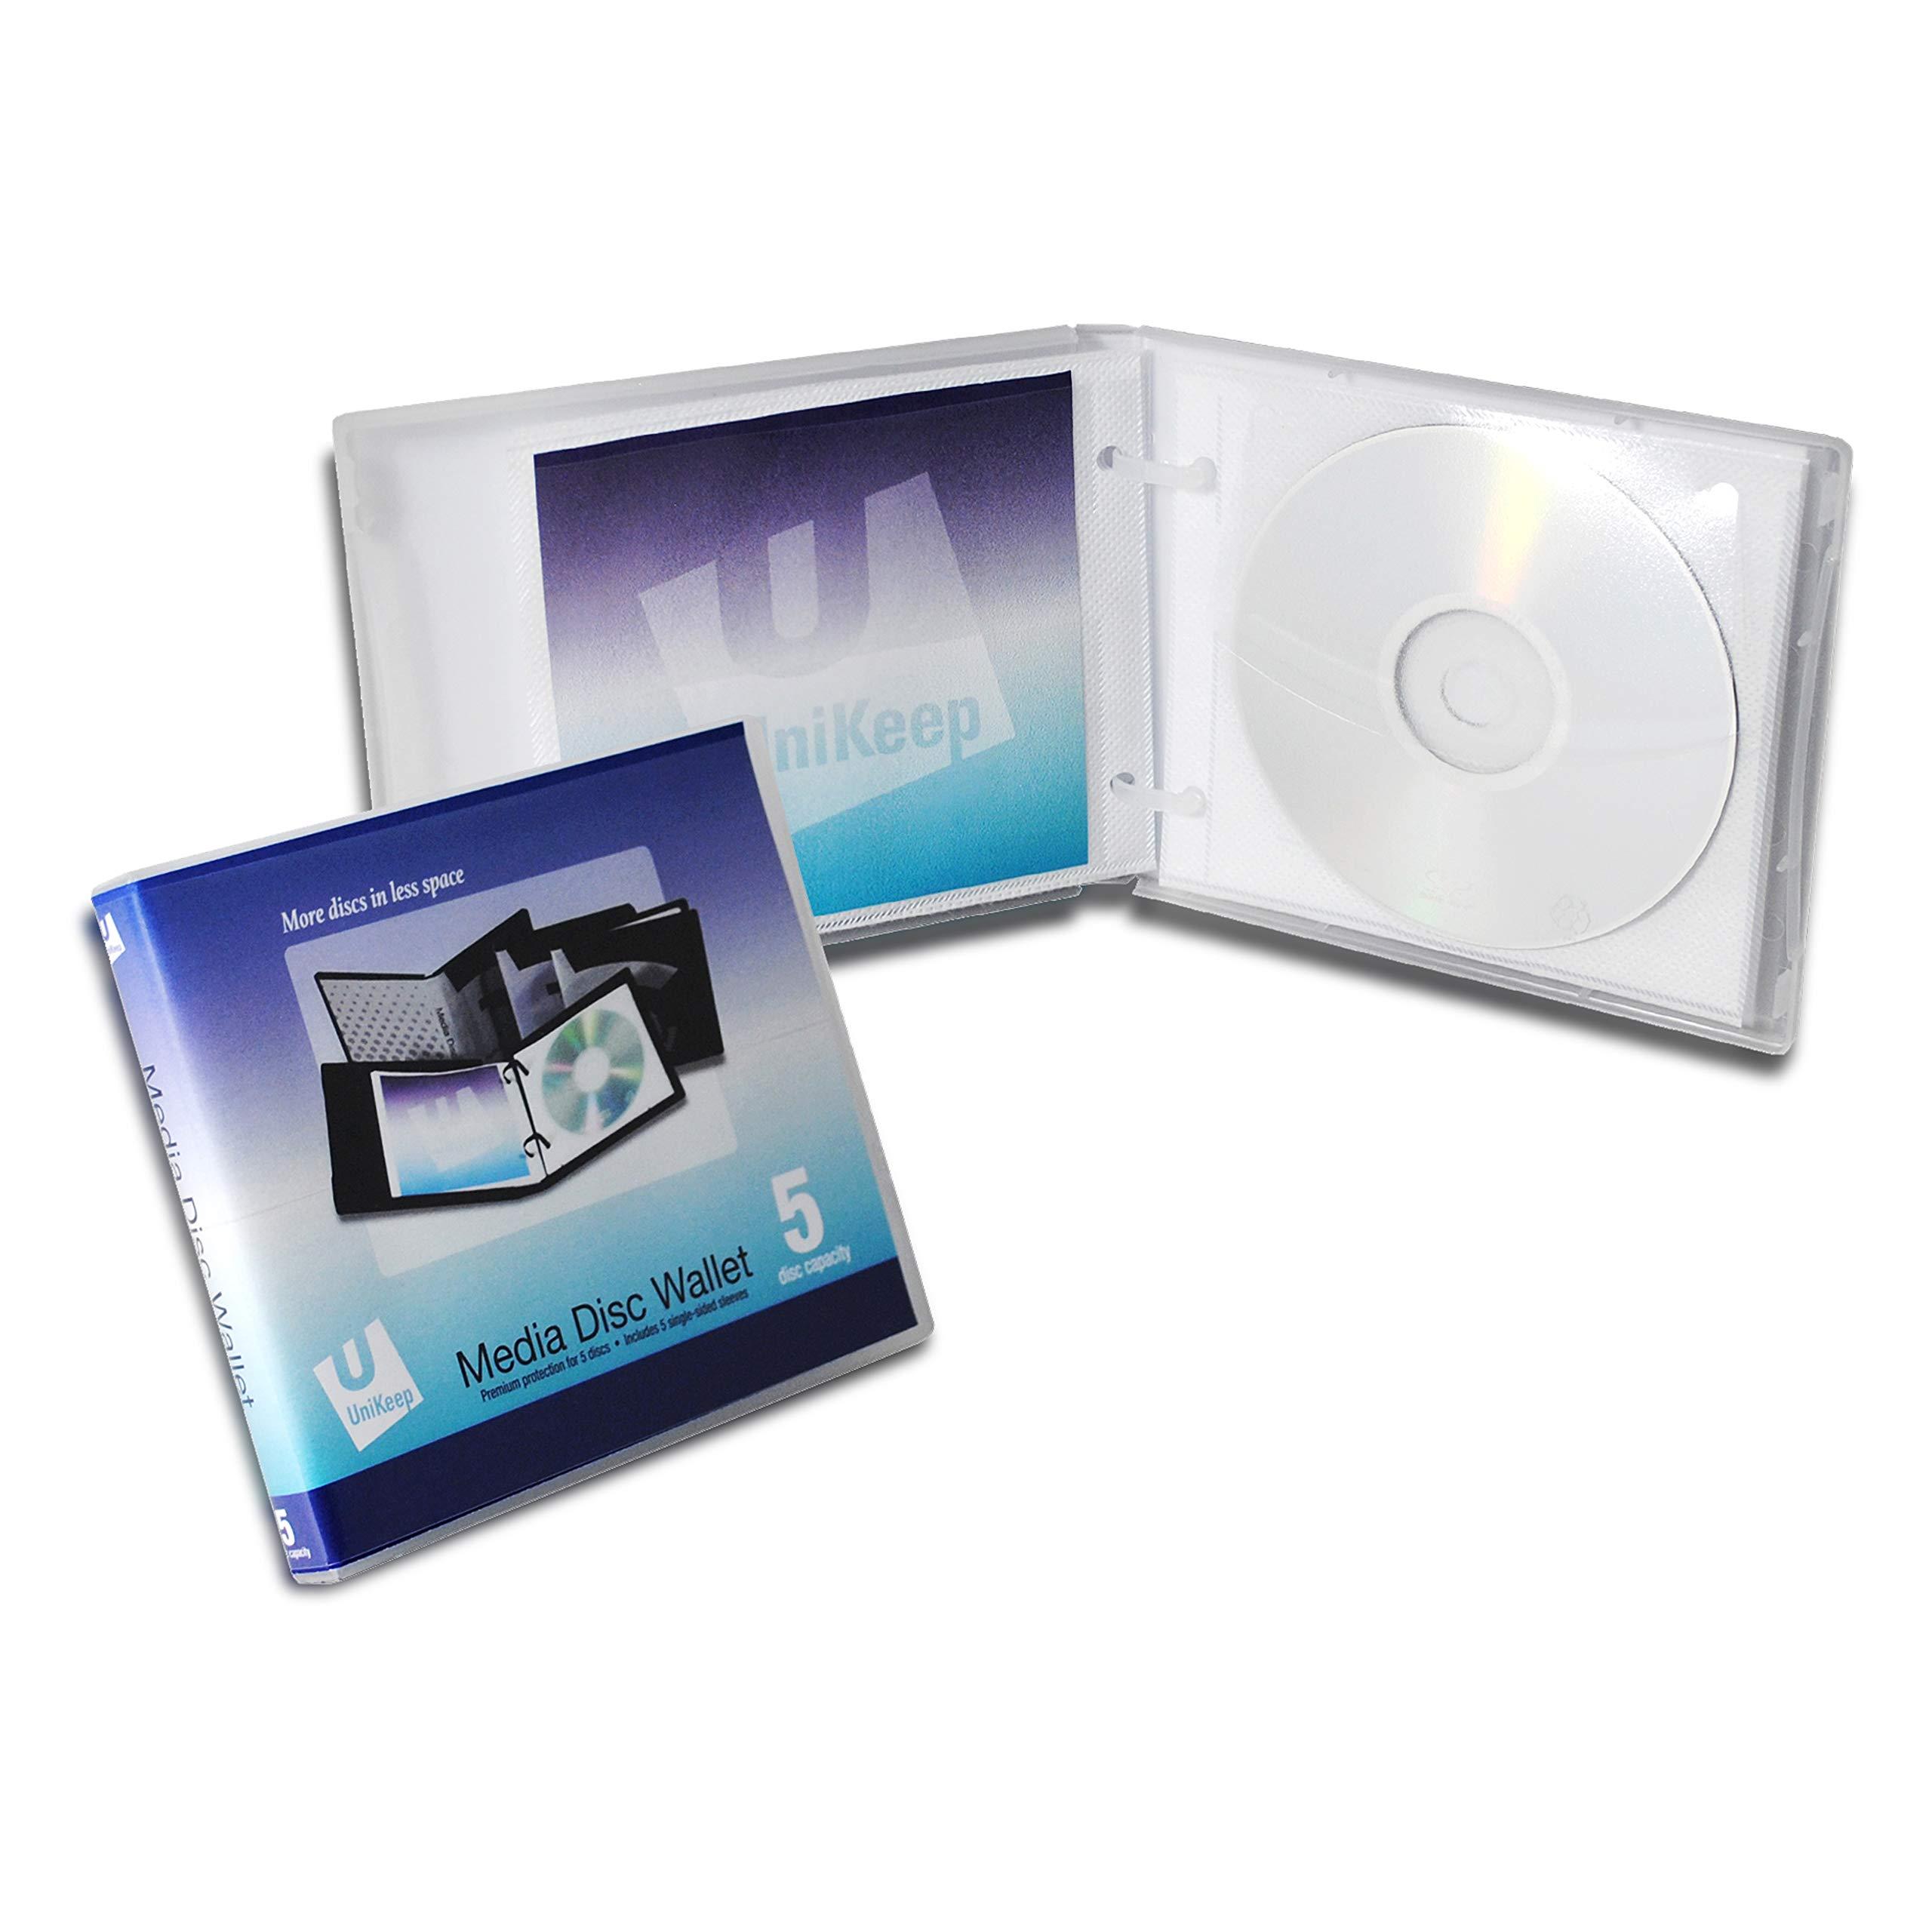 Empty UniKeep 5 CD | DVD Wallet - Case of 30 - Clear